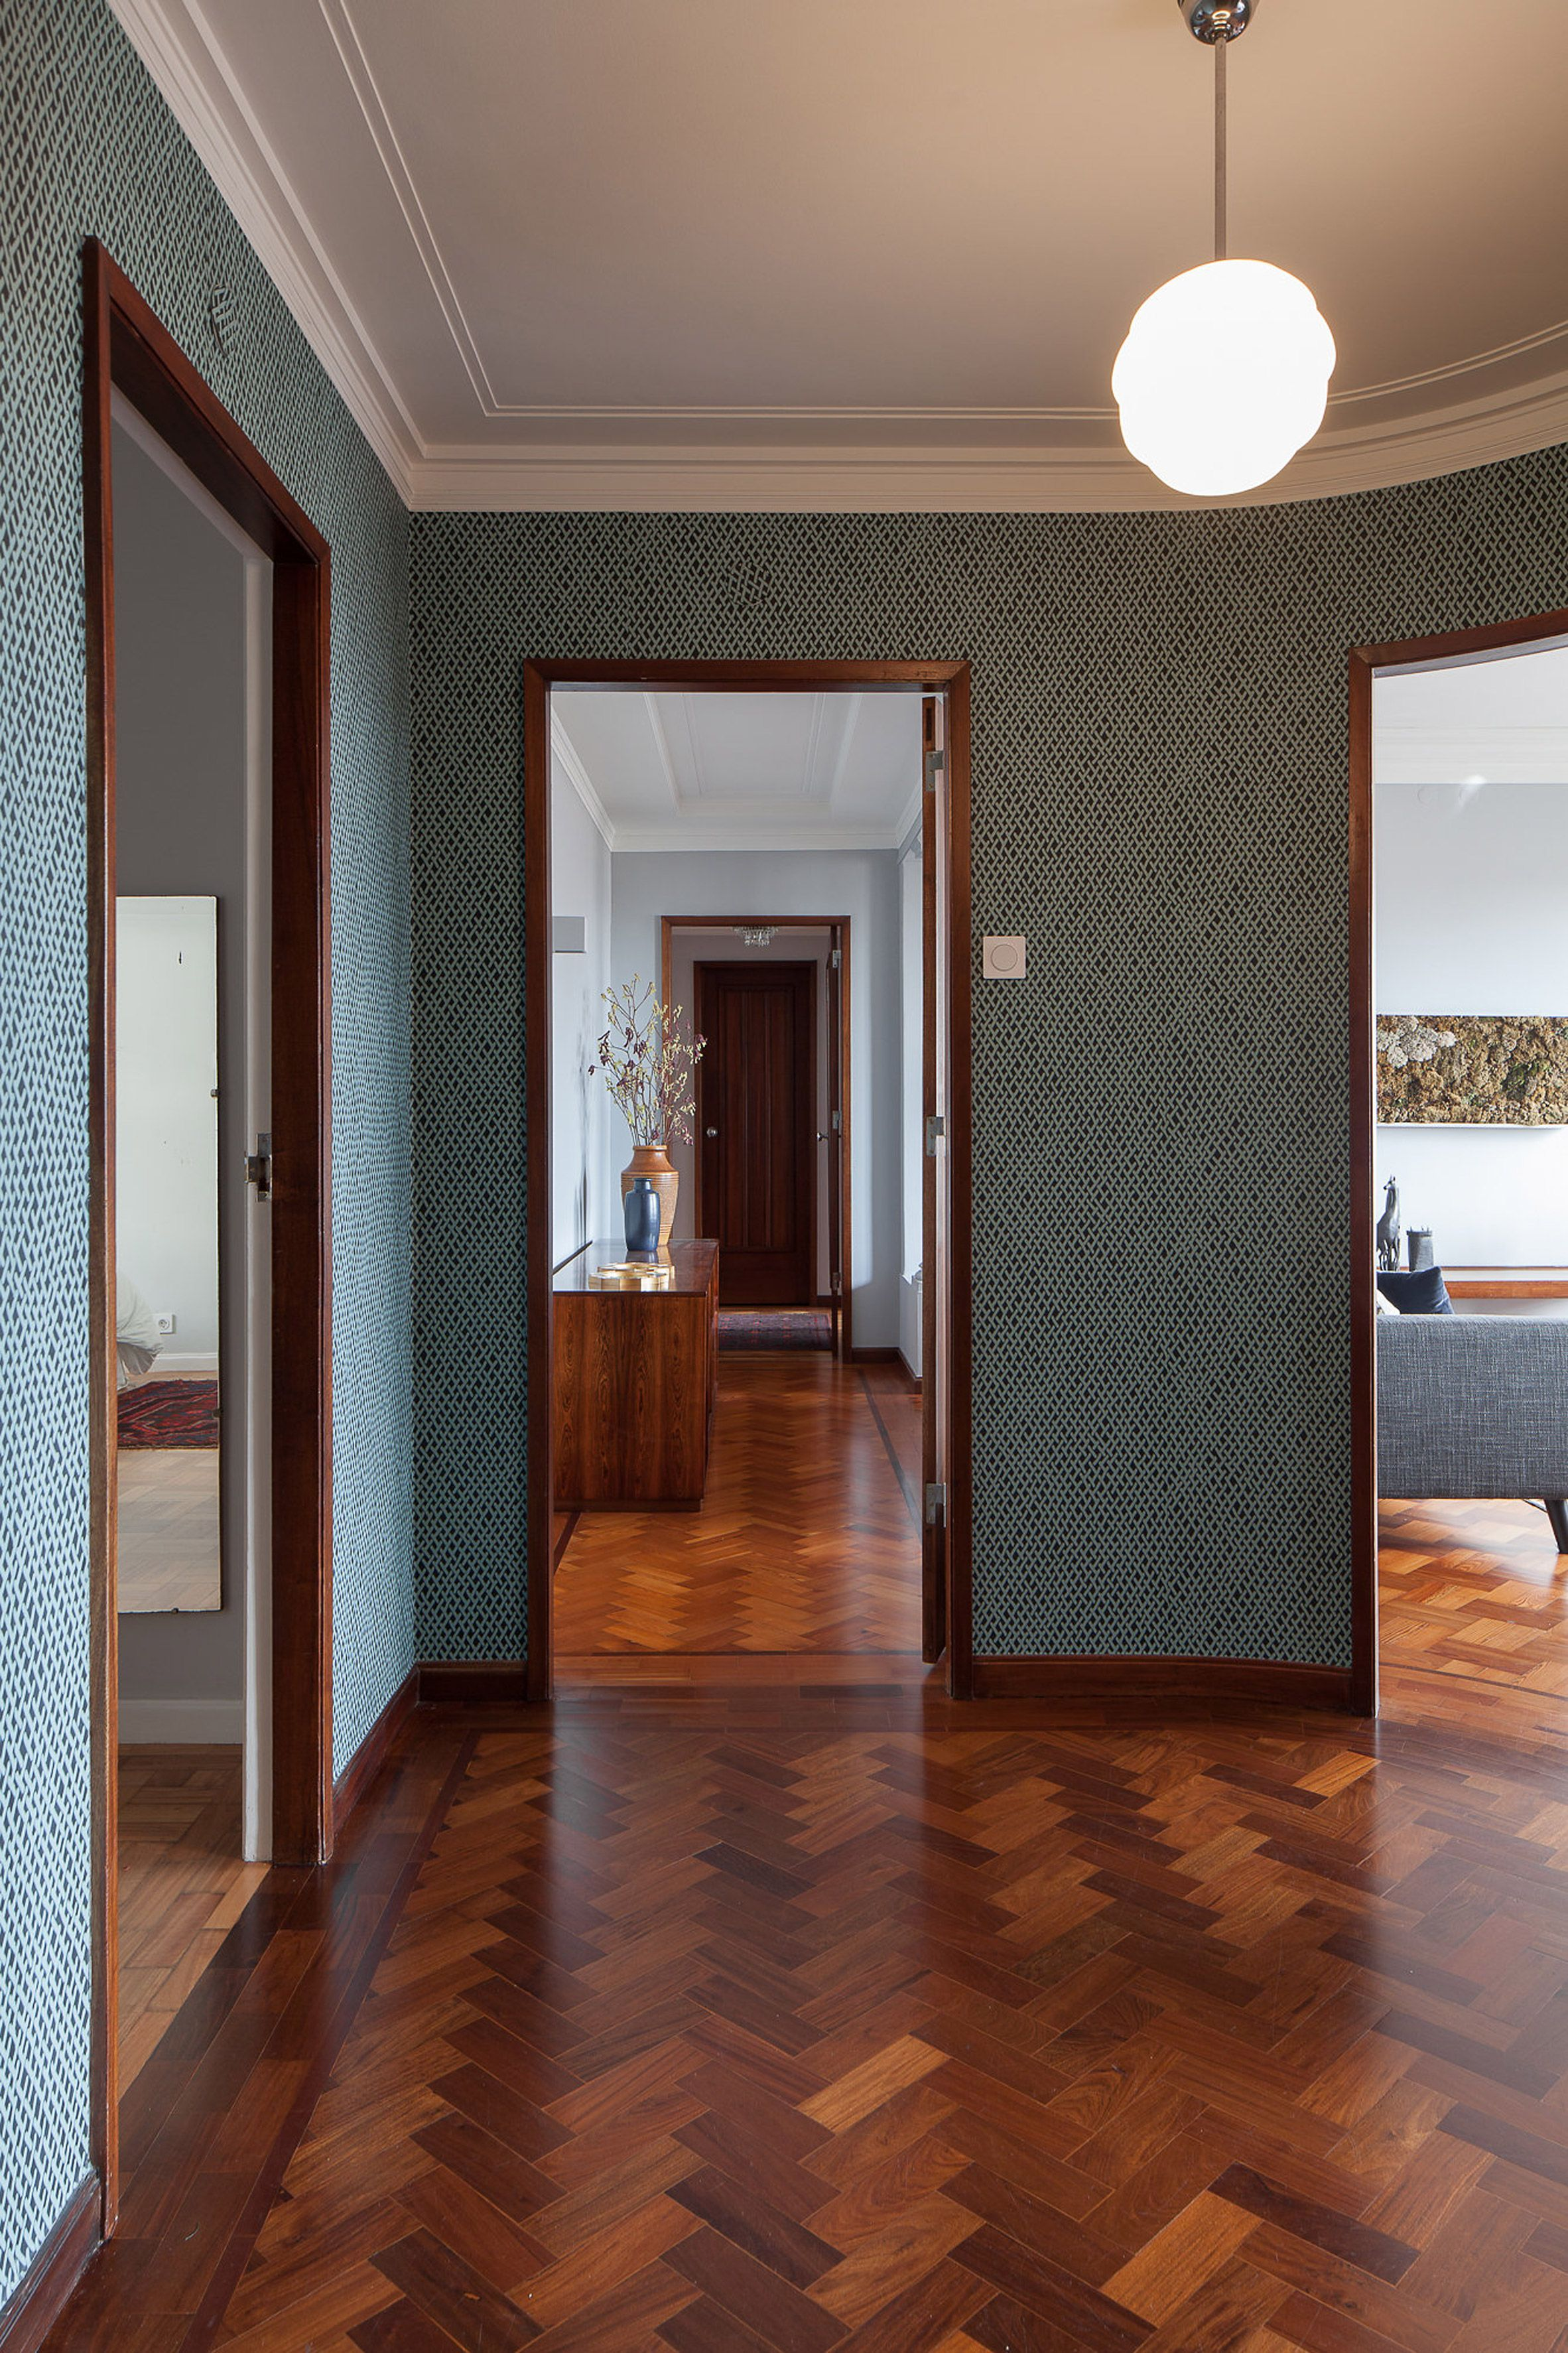 1930s hallway decorating ideas  Dazzling Apartments with Retro Interiors in s Porto Building